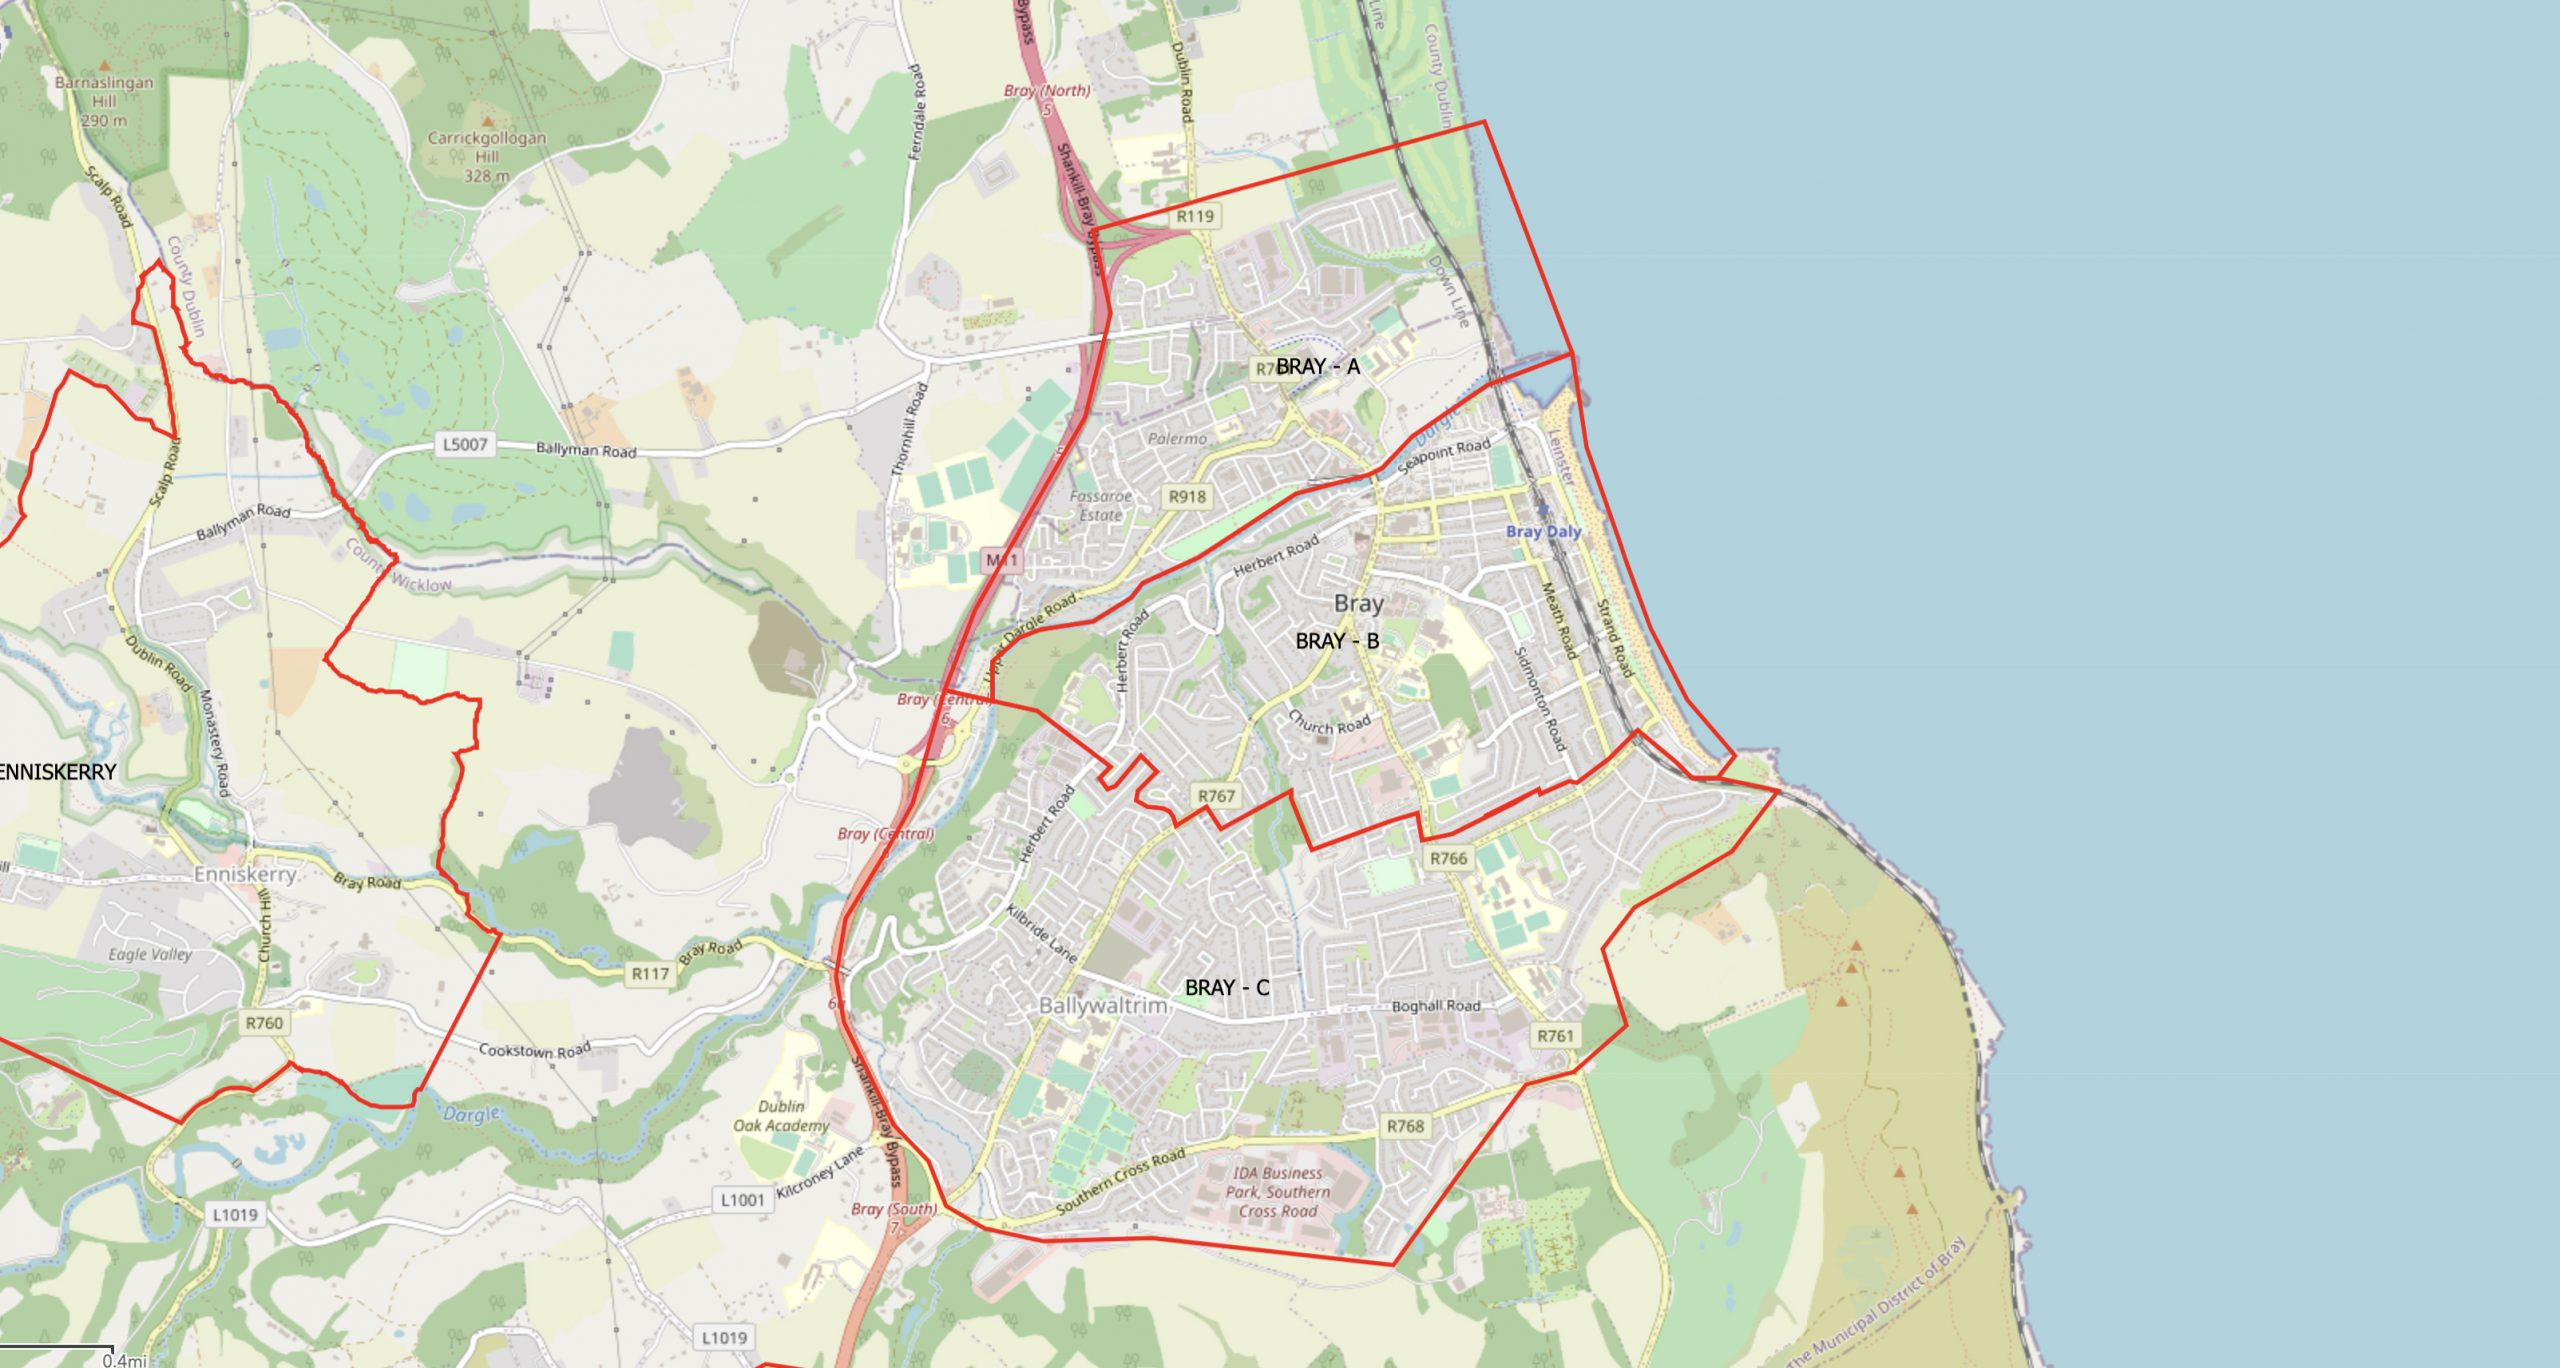 solar-panels-bray-wicklow-ireland-map-img